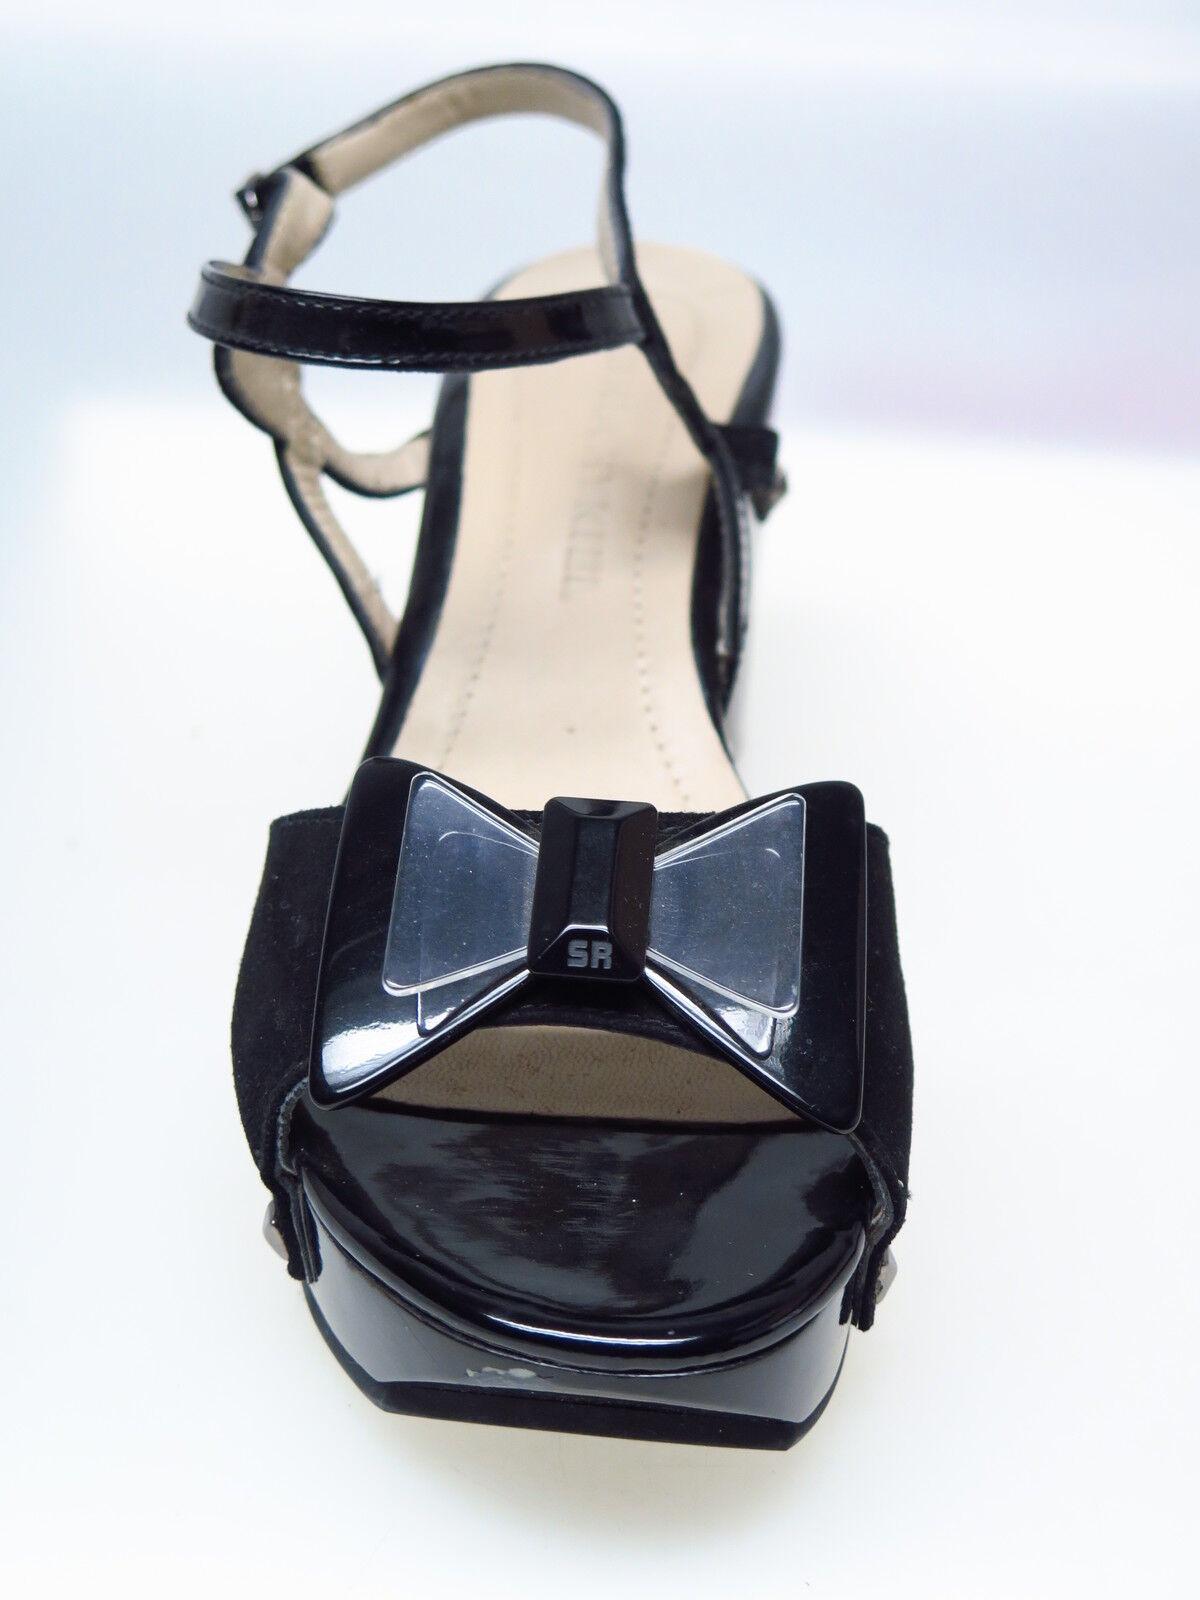 Sonia Rykiel Designer Damenschuhe Noir Talon Barnabe Sandale Noeud Bijoux Talon Noir 38 NEU 01c46f